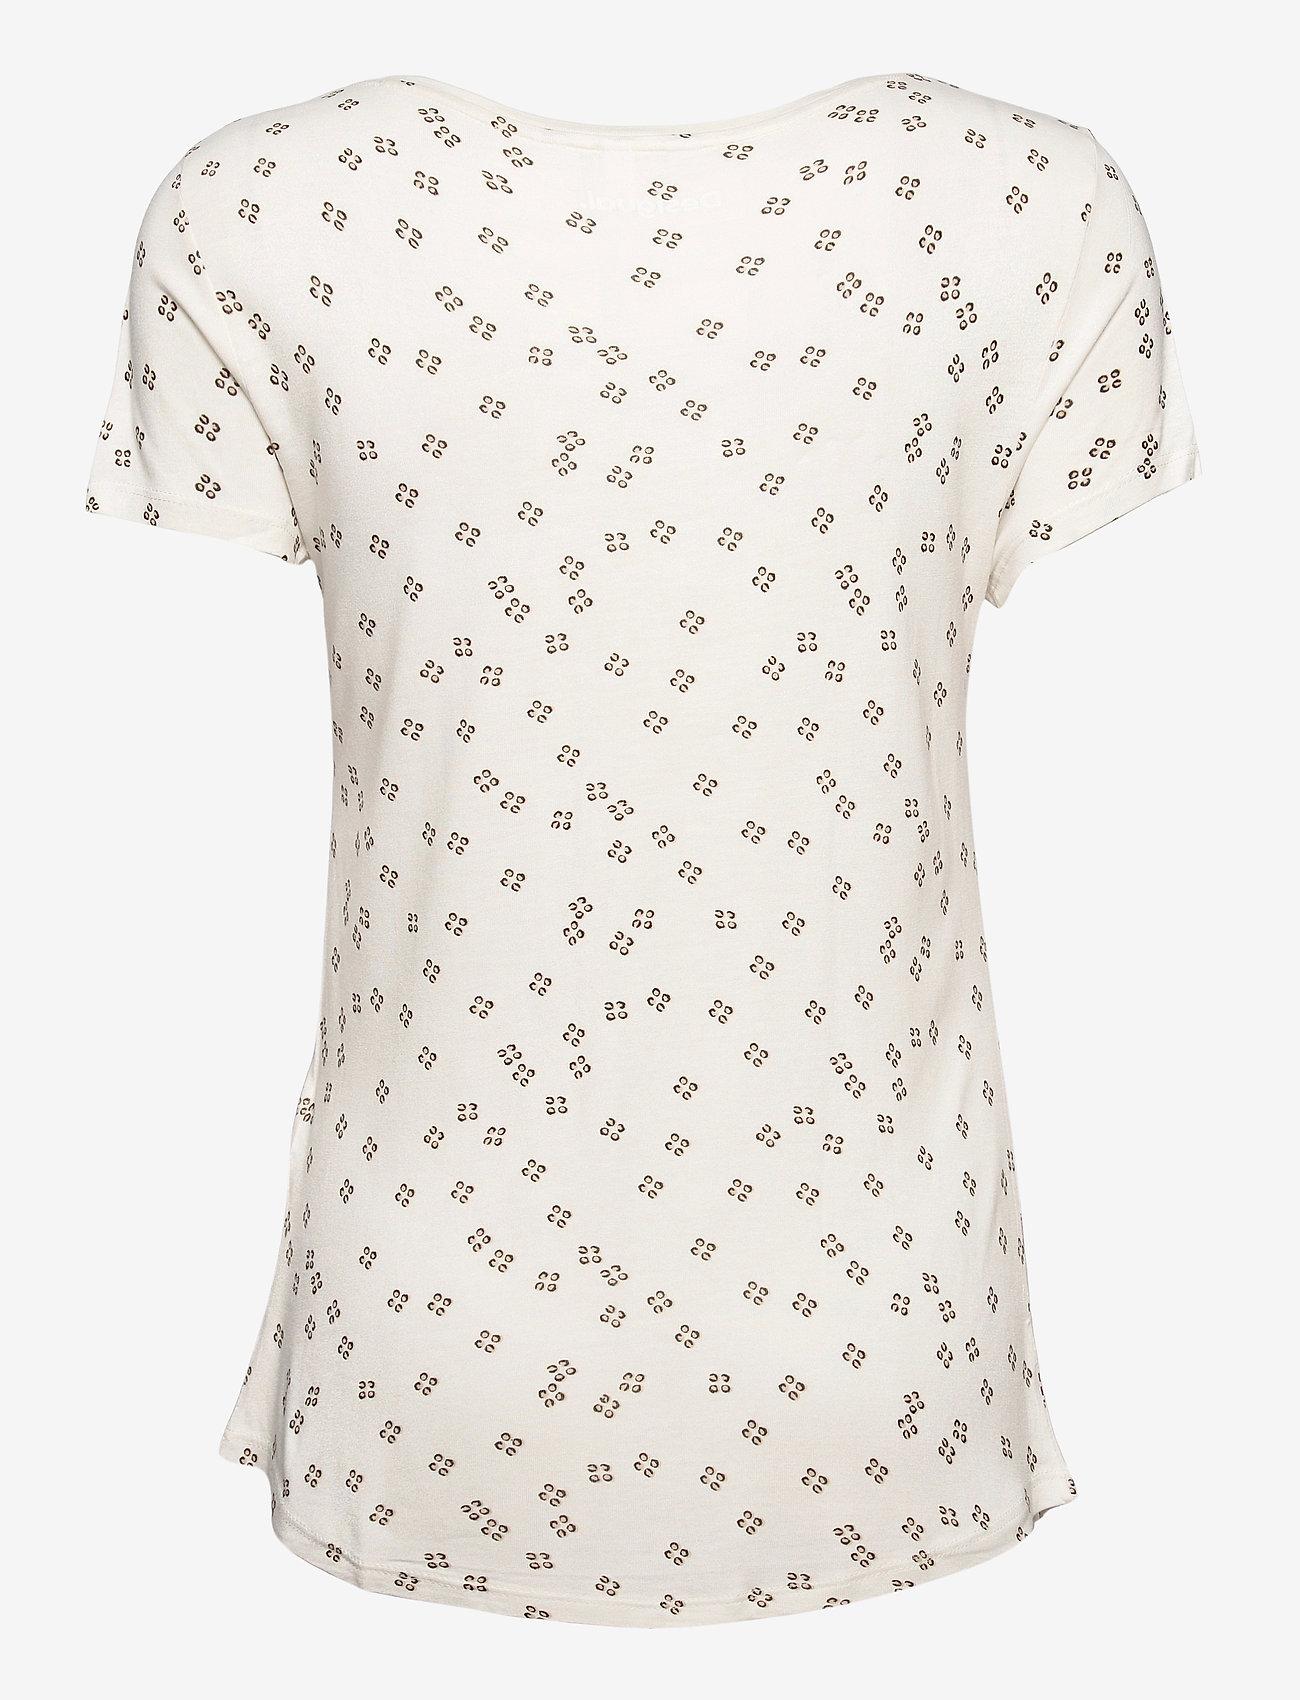 Desigual - TS ESTAMBUL - t-shirts - crudo - 1